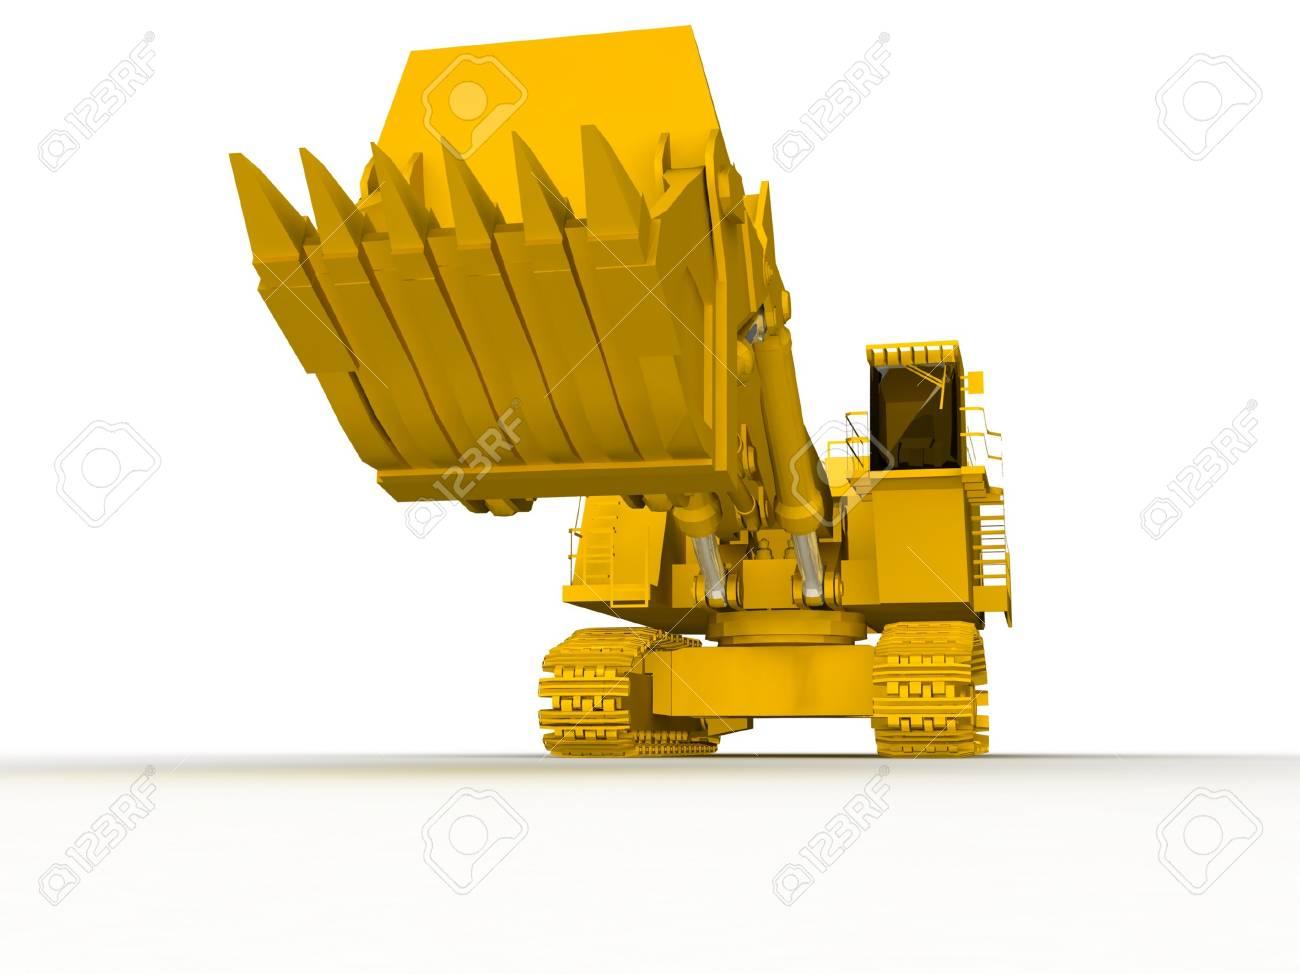 bulldozer-excavator isolated on white Stock Photo - 17124594